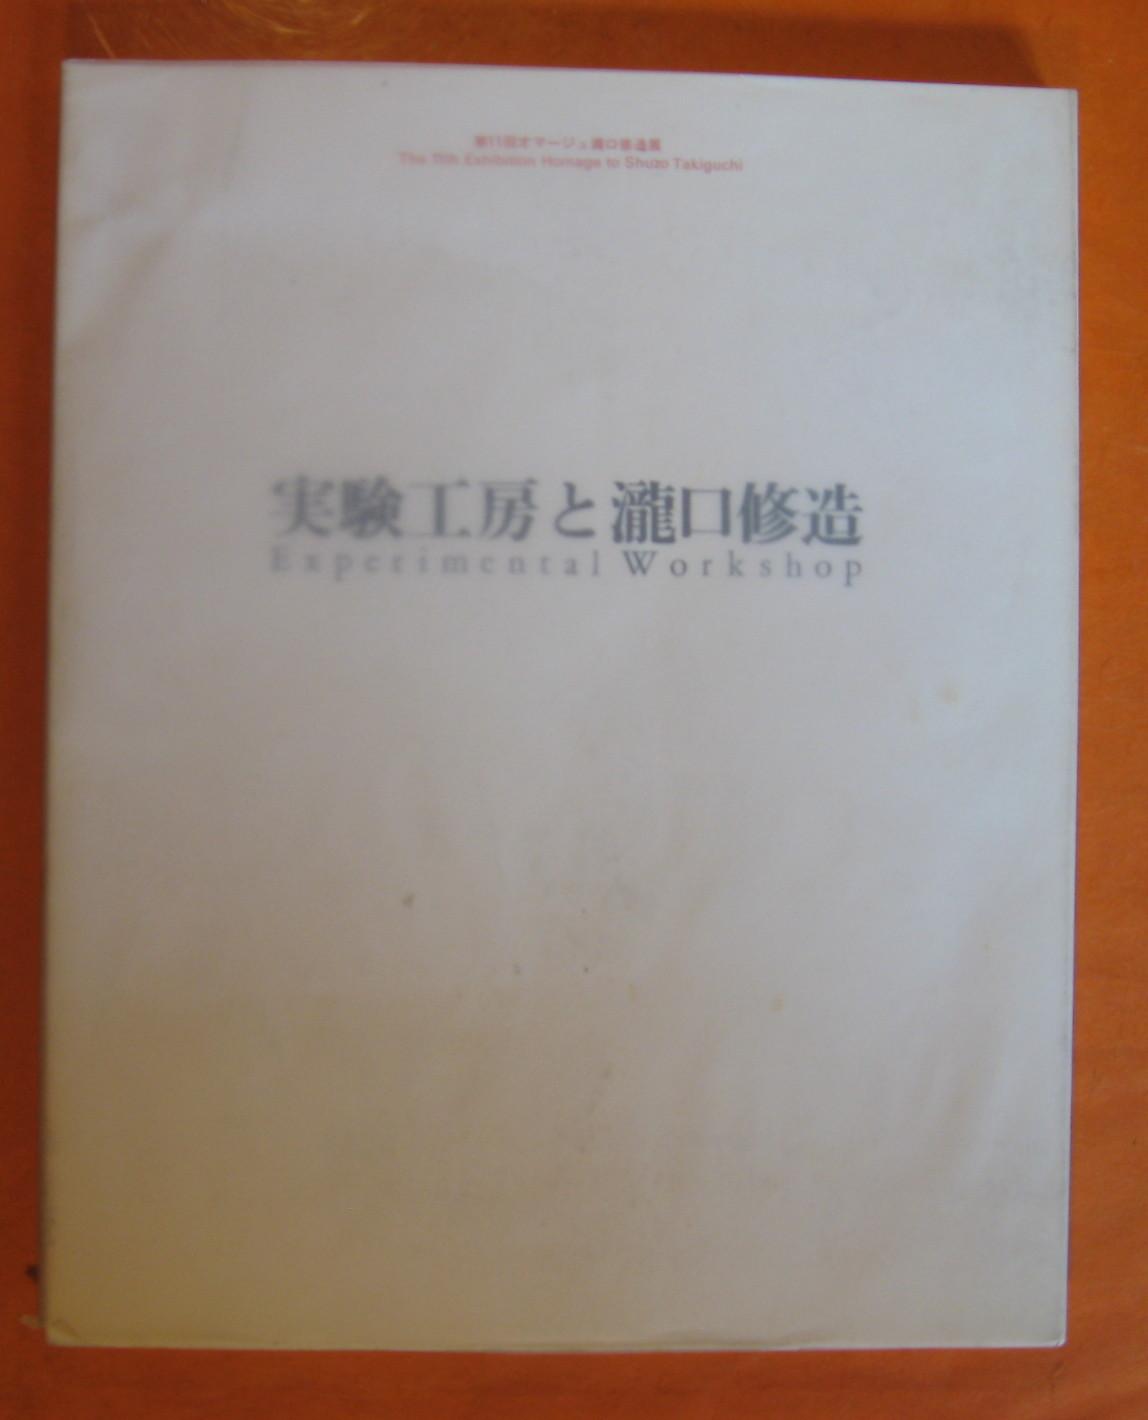 11th Exhibition Homage to Shuzo Takiguchi Experimental Workshop ( July 8 - 31, 1991), No Author